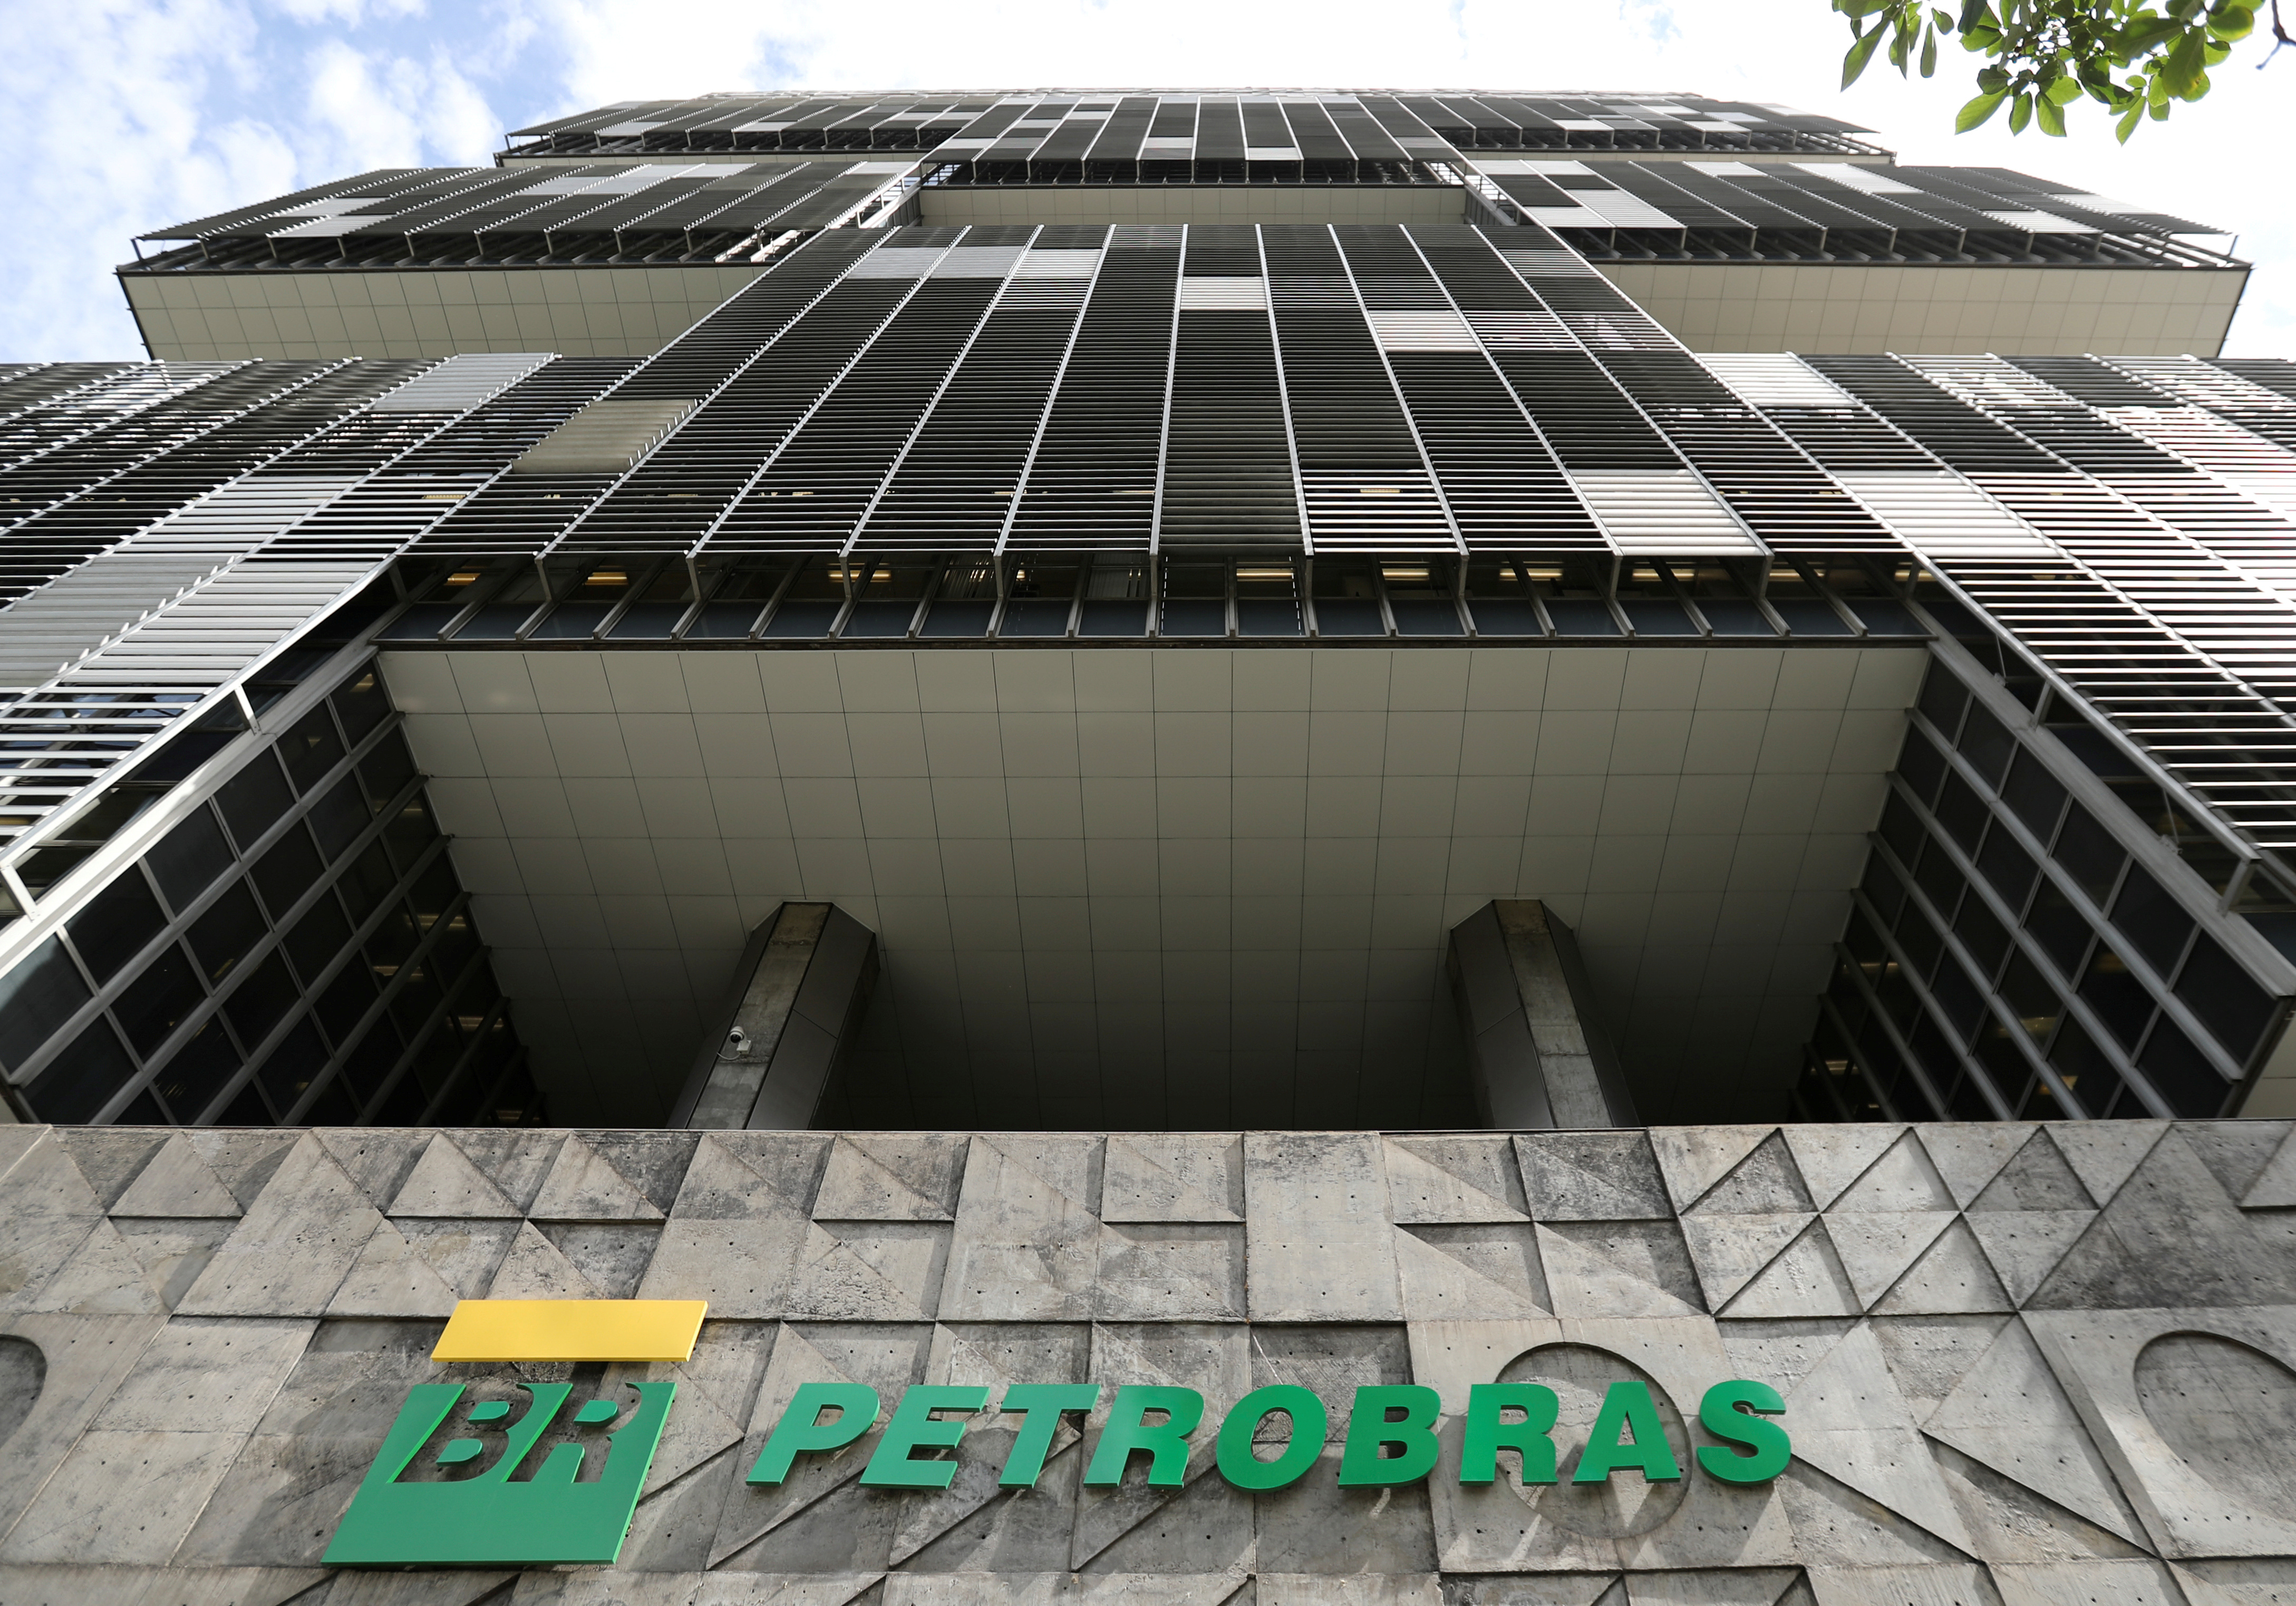 The facade of the headquarters of Petroleo Brasileiro S.A. (PETROBRAS) is pictured in Rio de Janeiro, Brazil December 9, 2019.  REUTERS/Sergio Moraes/File Photo